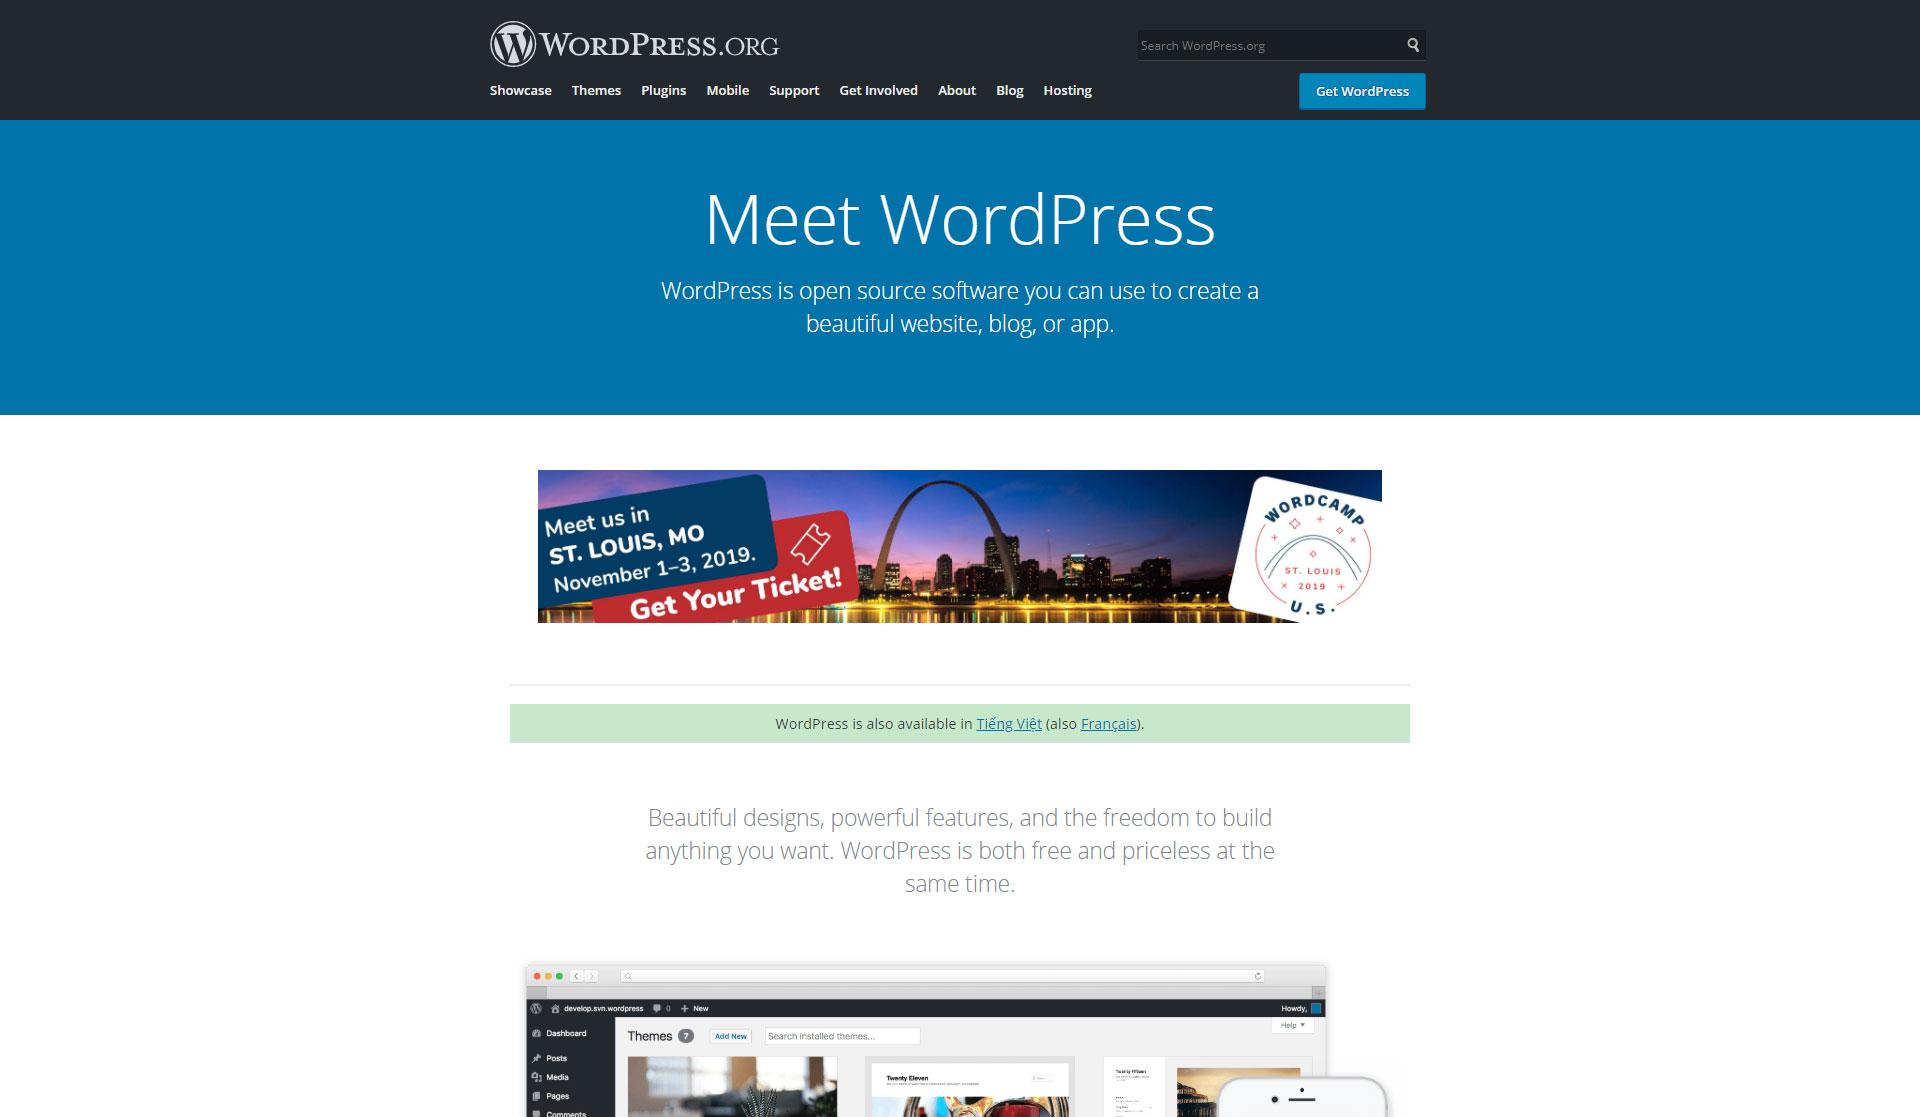 WordPress - Best Free Content Management System